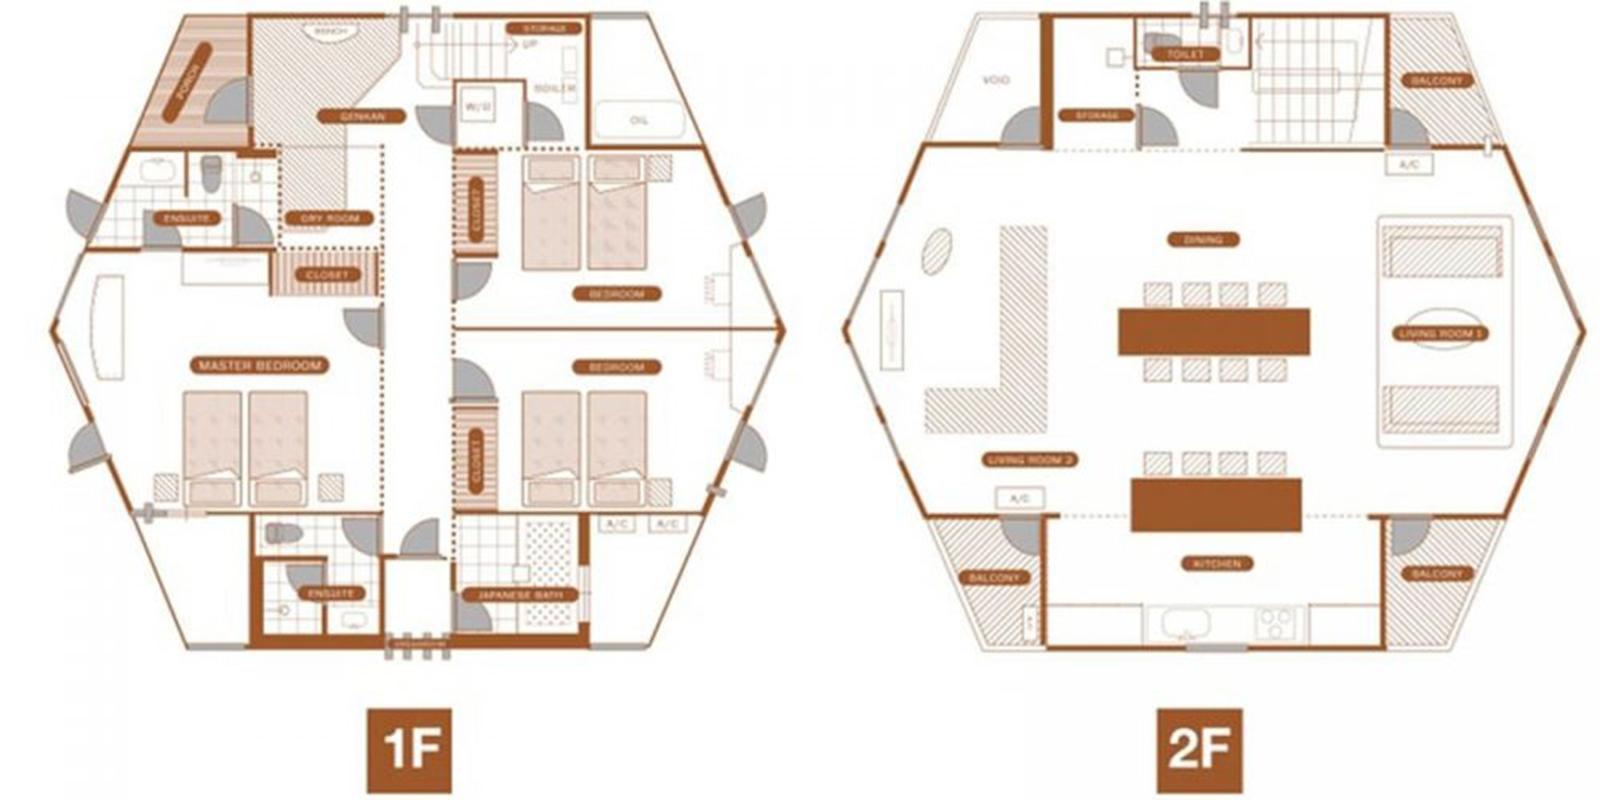 The Orchards Niseko Hinoki Floor Plan | St Moritz, Niseko | Ministry of Chalets